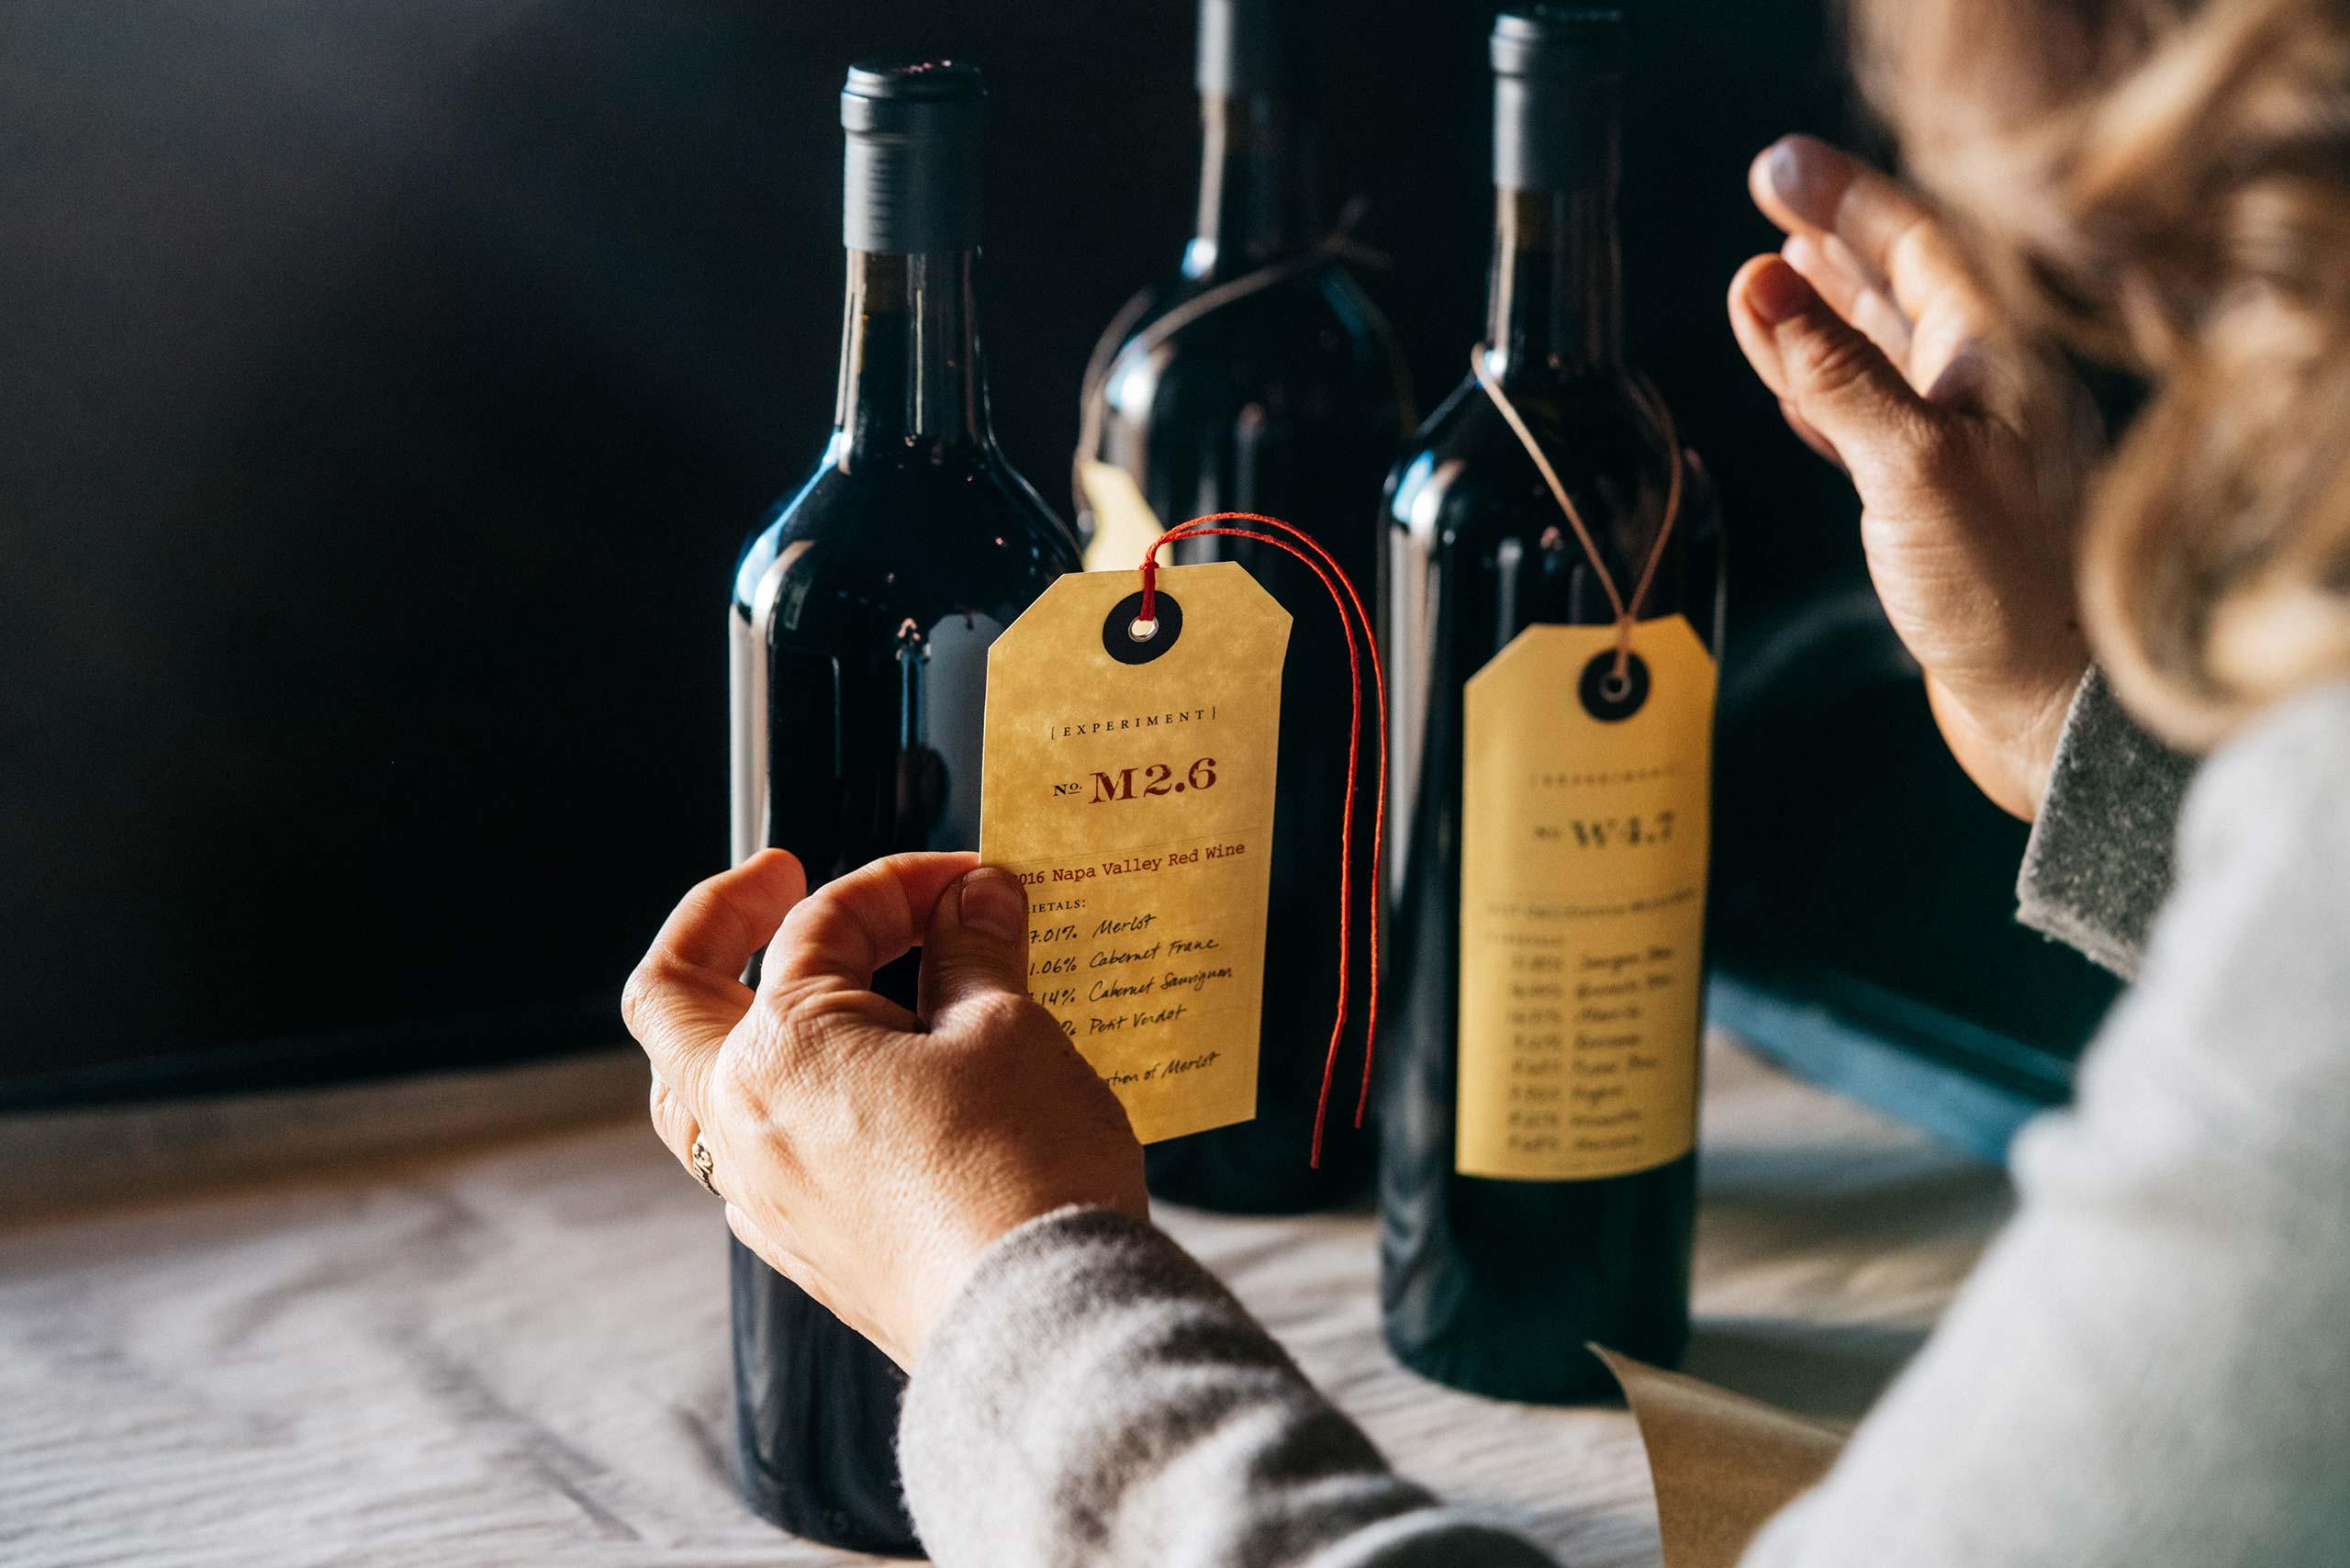 Labeling Experiment bottles